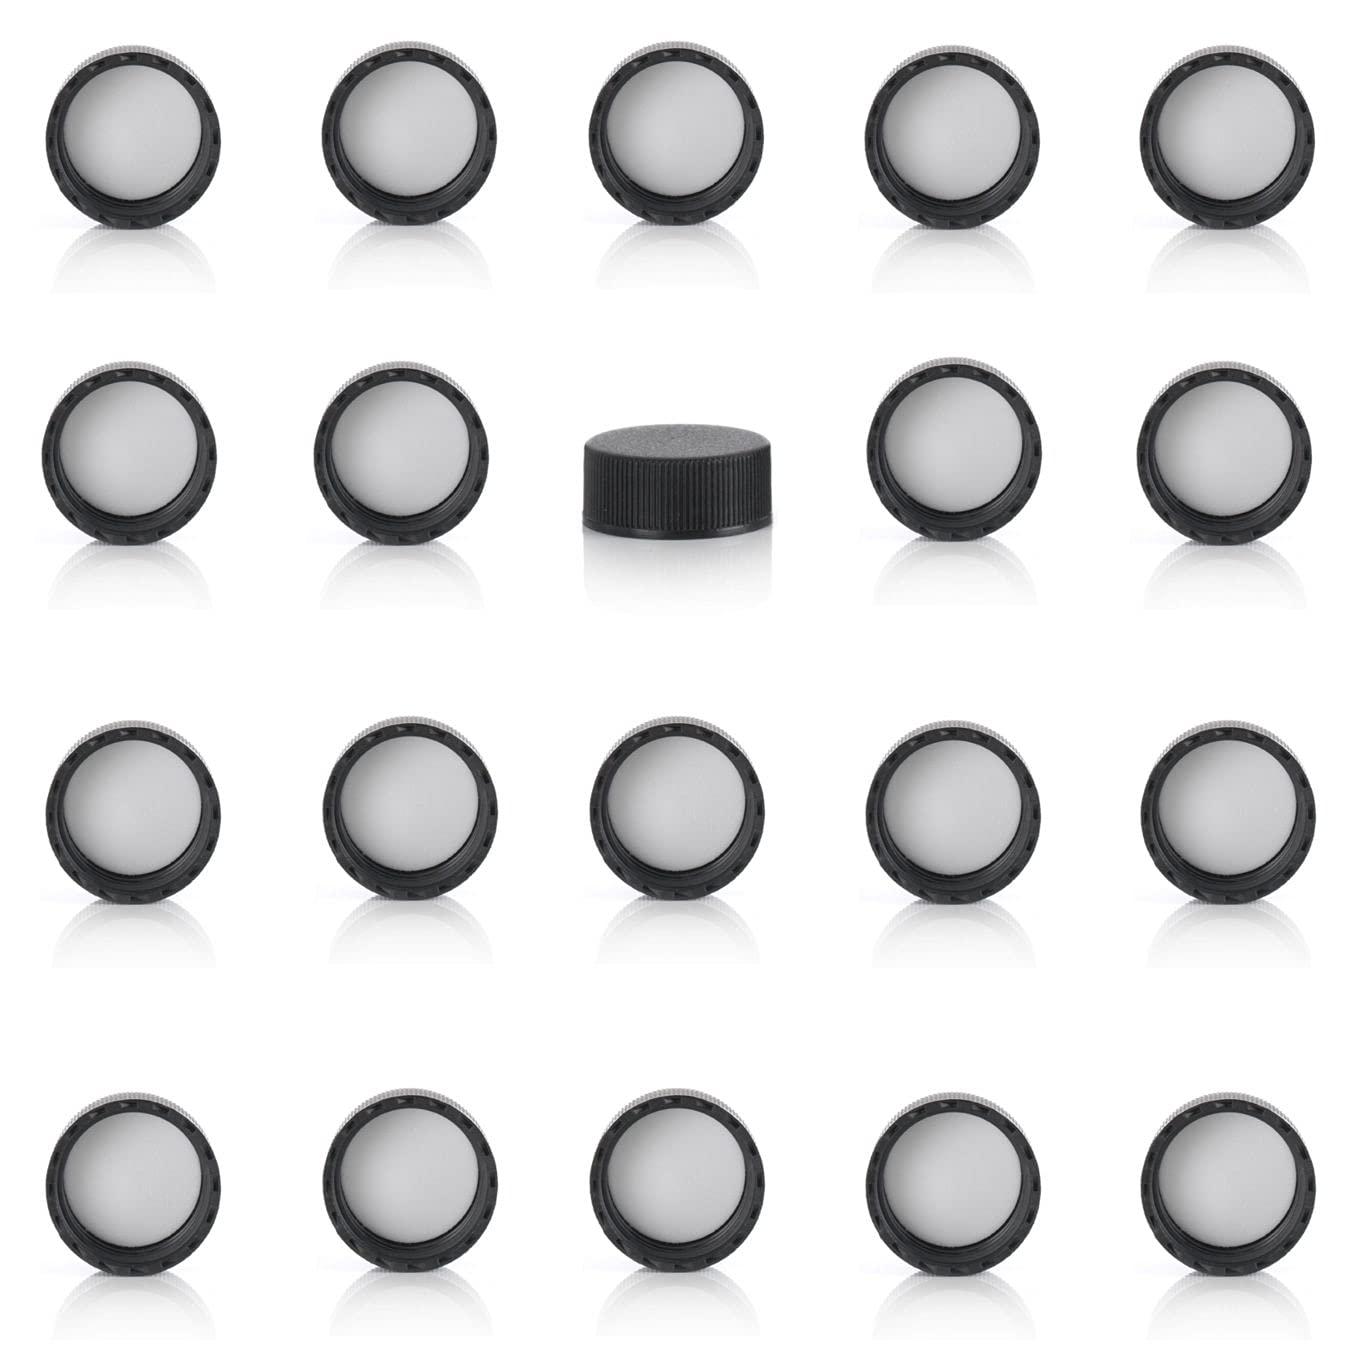 Magnakoys Max 52% OFF Black Manufacturer OFFicial shop 20-400 Continuous Thread for Vials Caps Closure